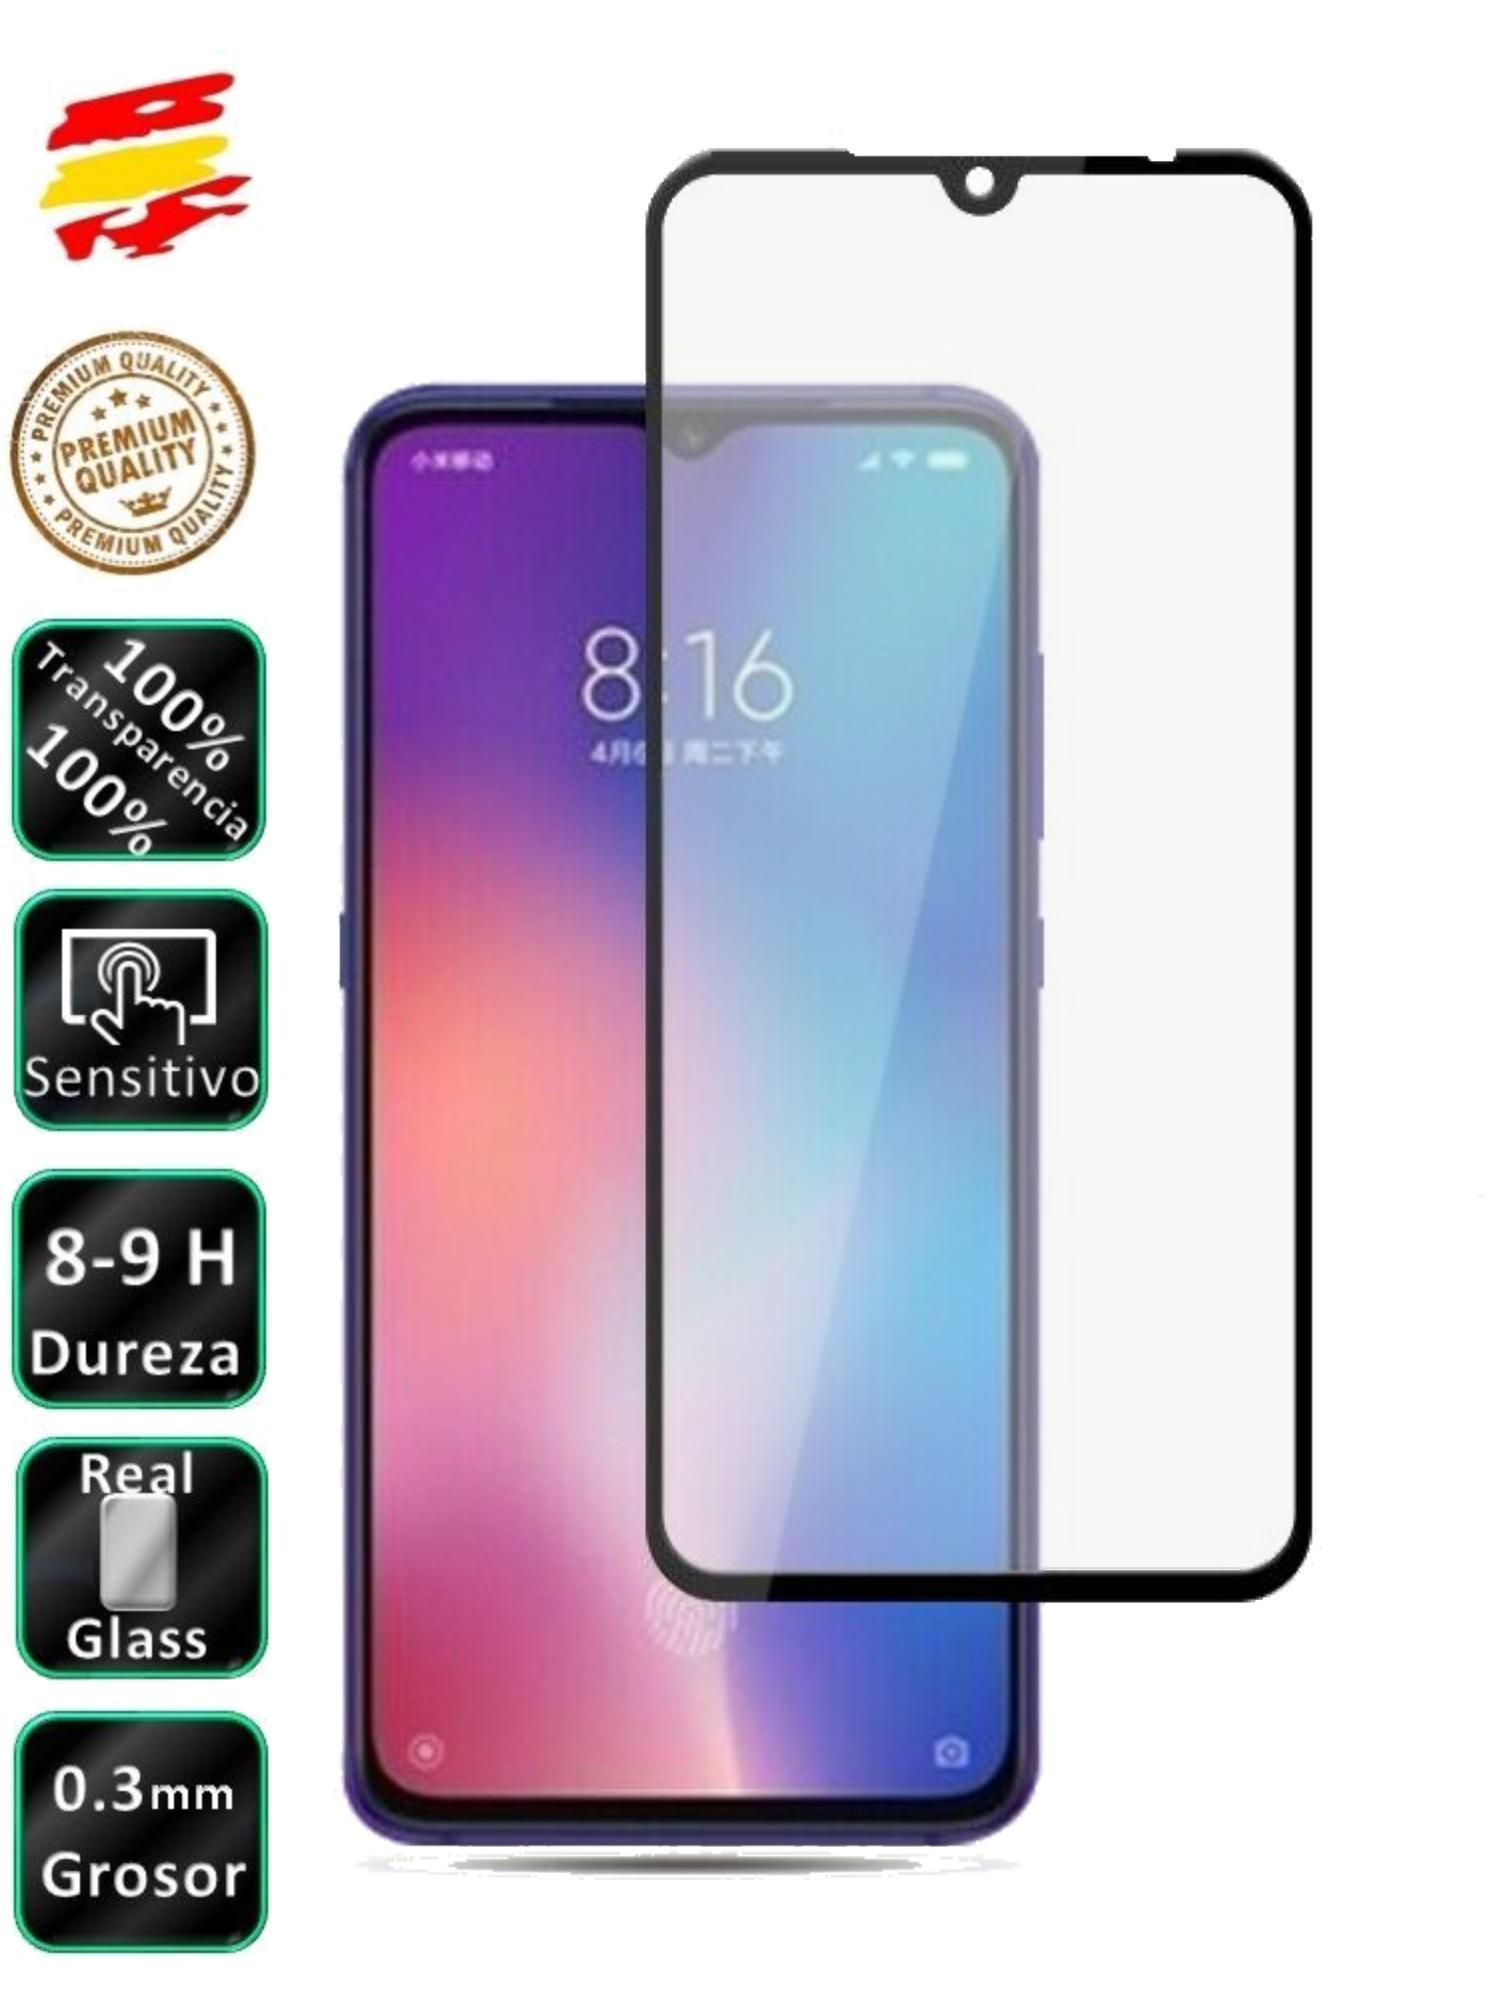 Protector Xiaomi MI 9 /9 LITE /9 PRO Negro Cristal Templado de Pantalla Vidrio movil